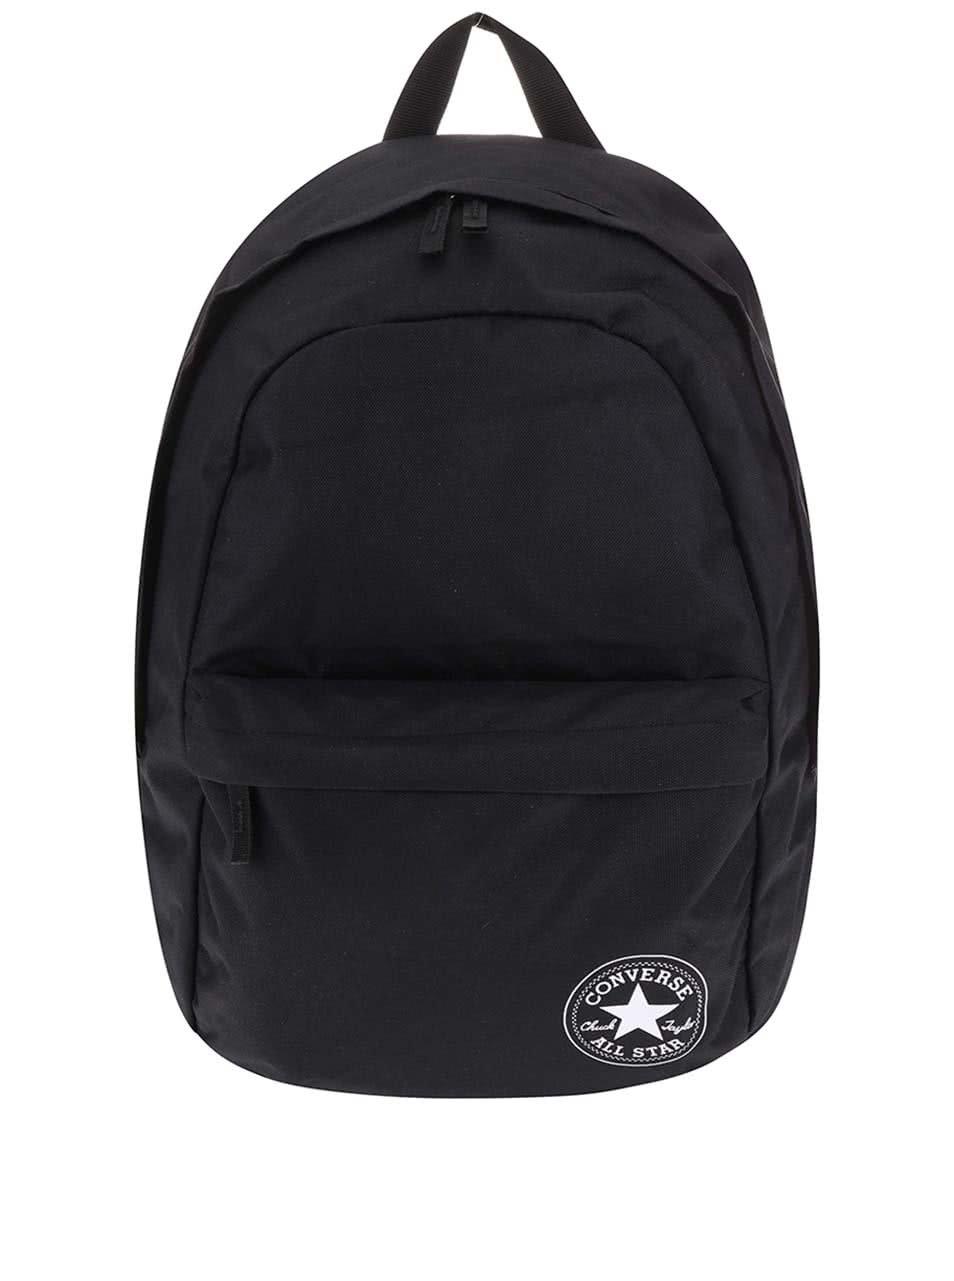 Černý unisex batoh s logem Converse Chuck Taylor All Star ... f5c5218bf0